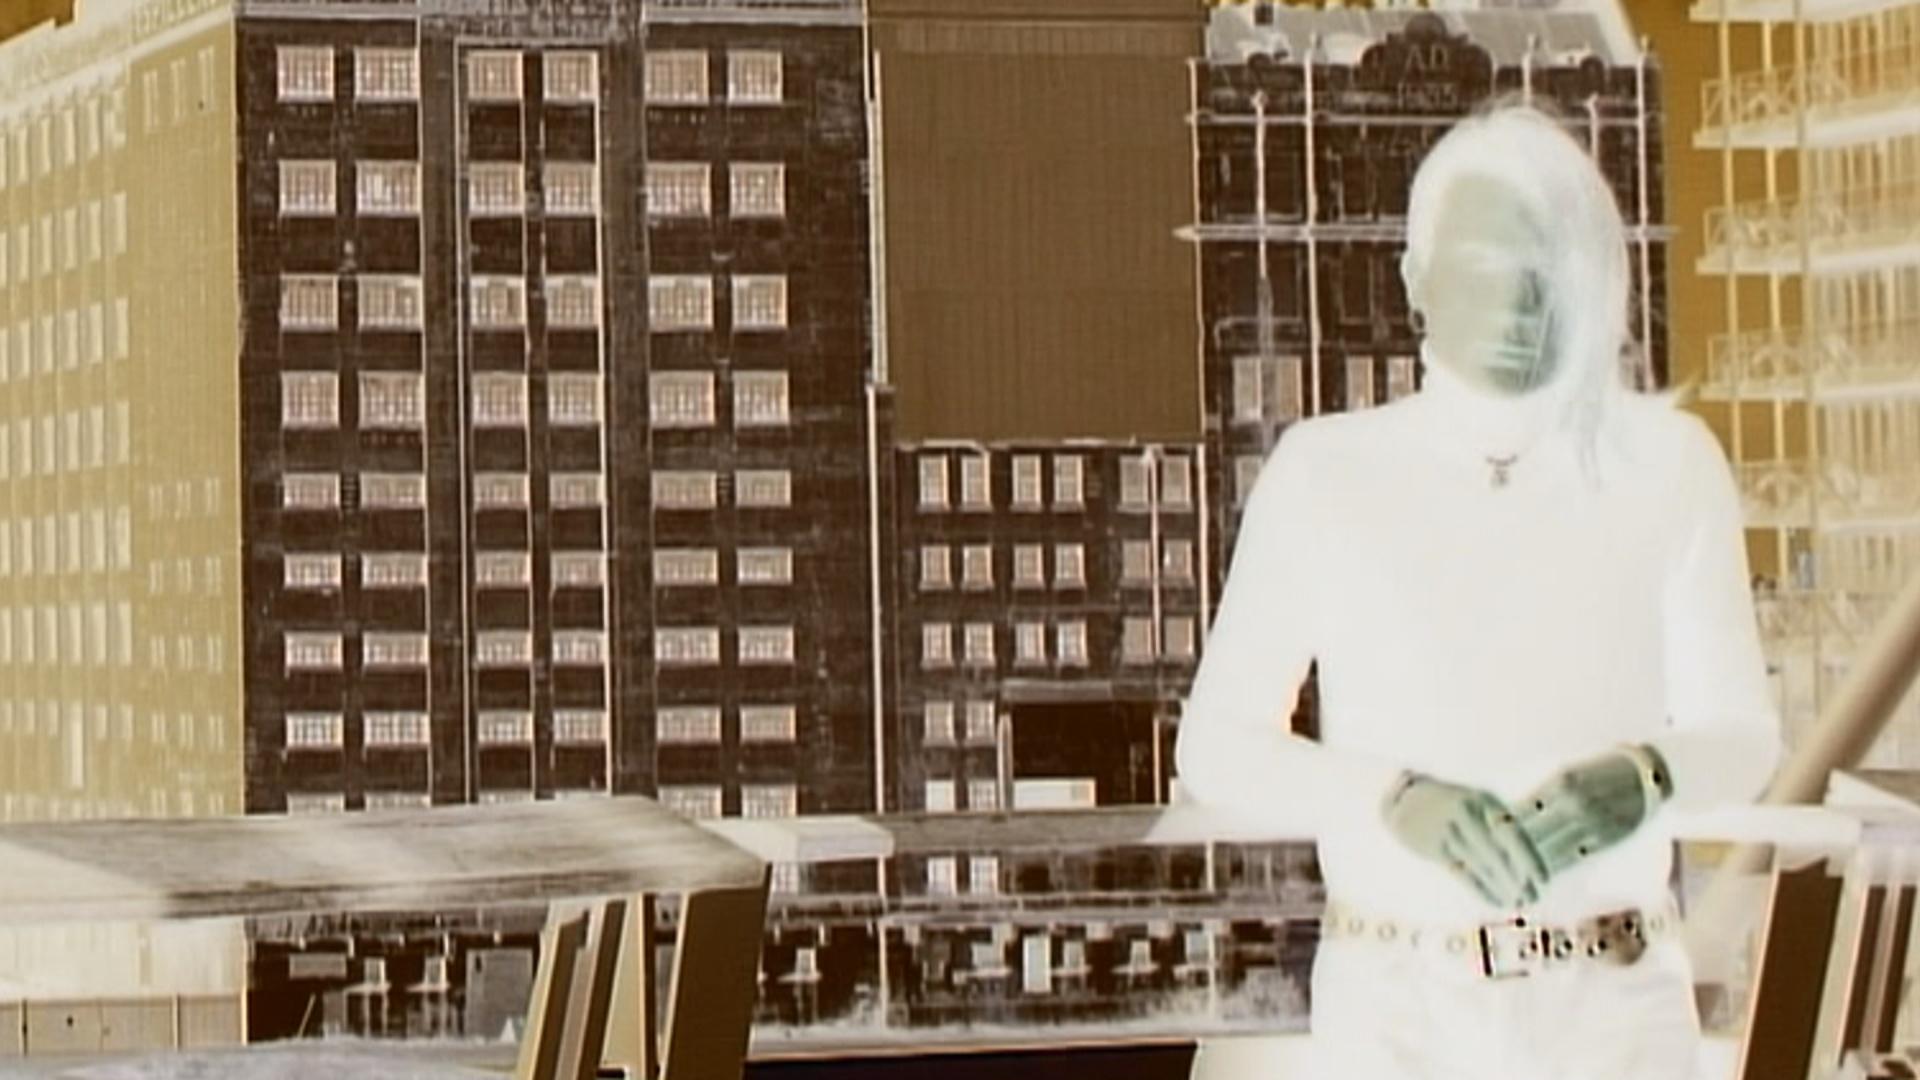 Rohan Quine, 'The Imagination Thief' - film 'MARC 5', still 7